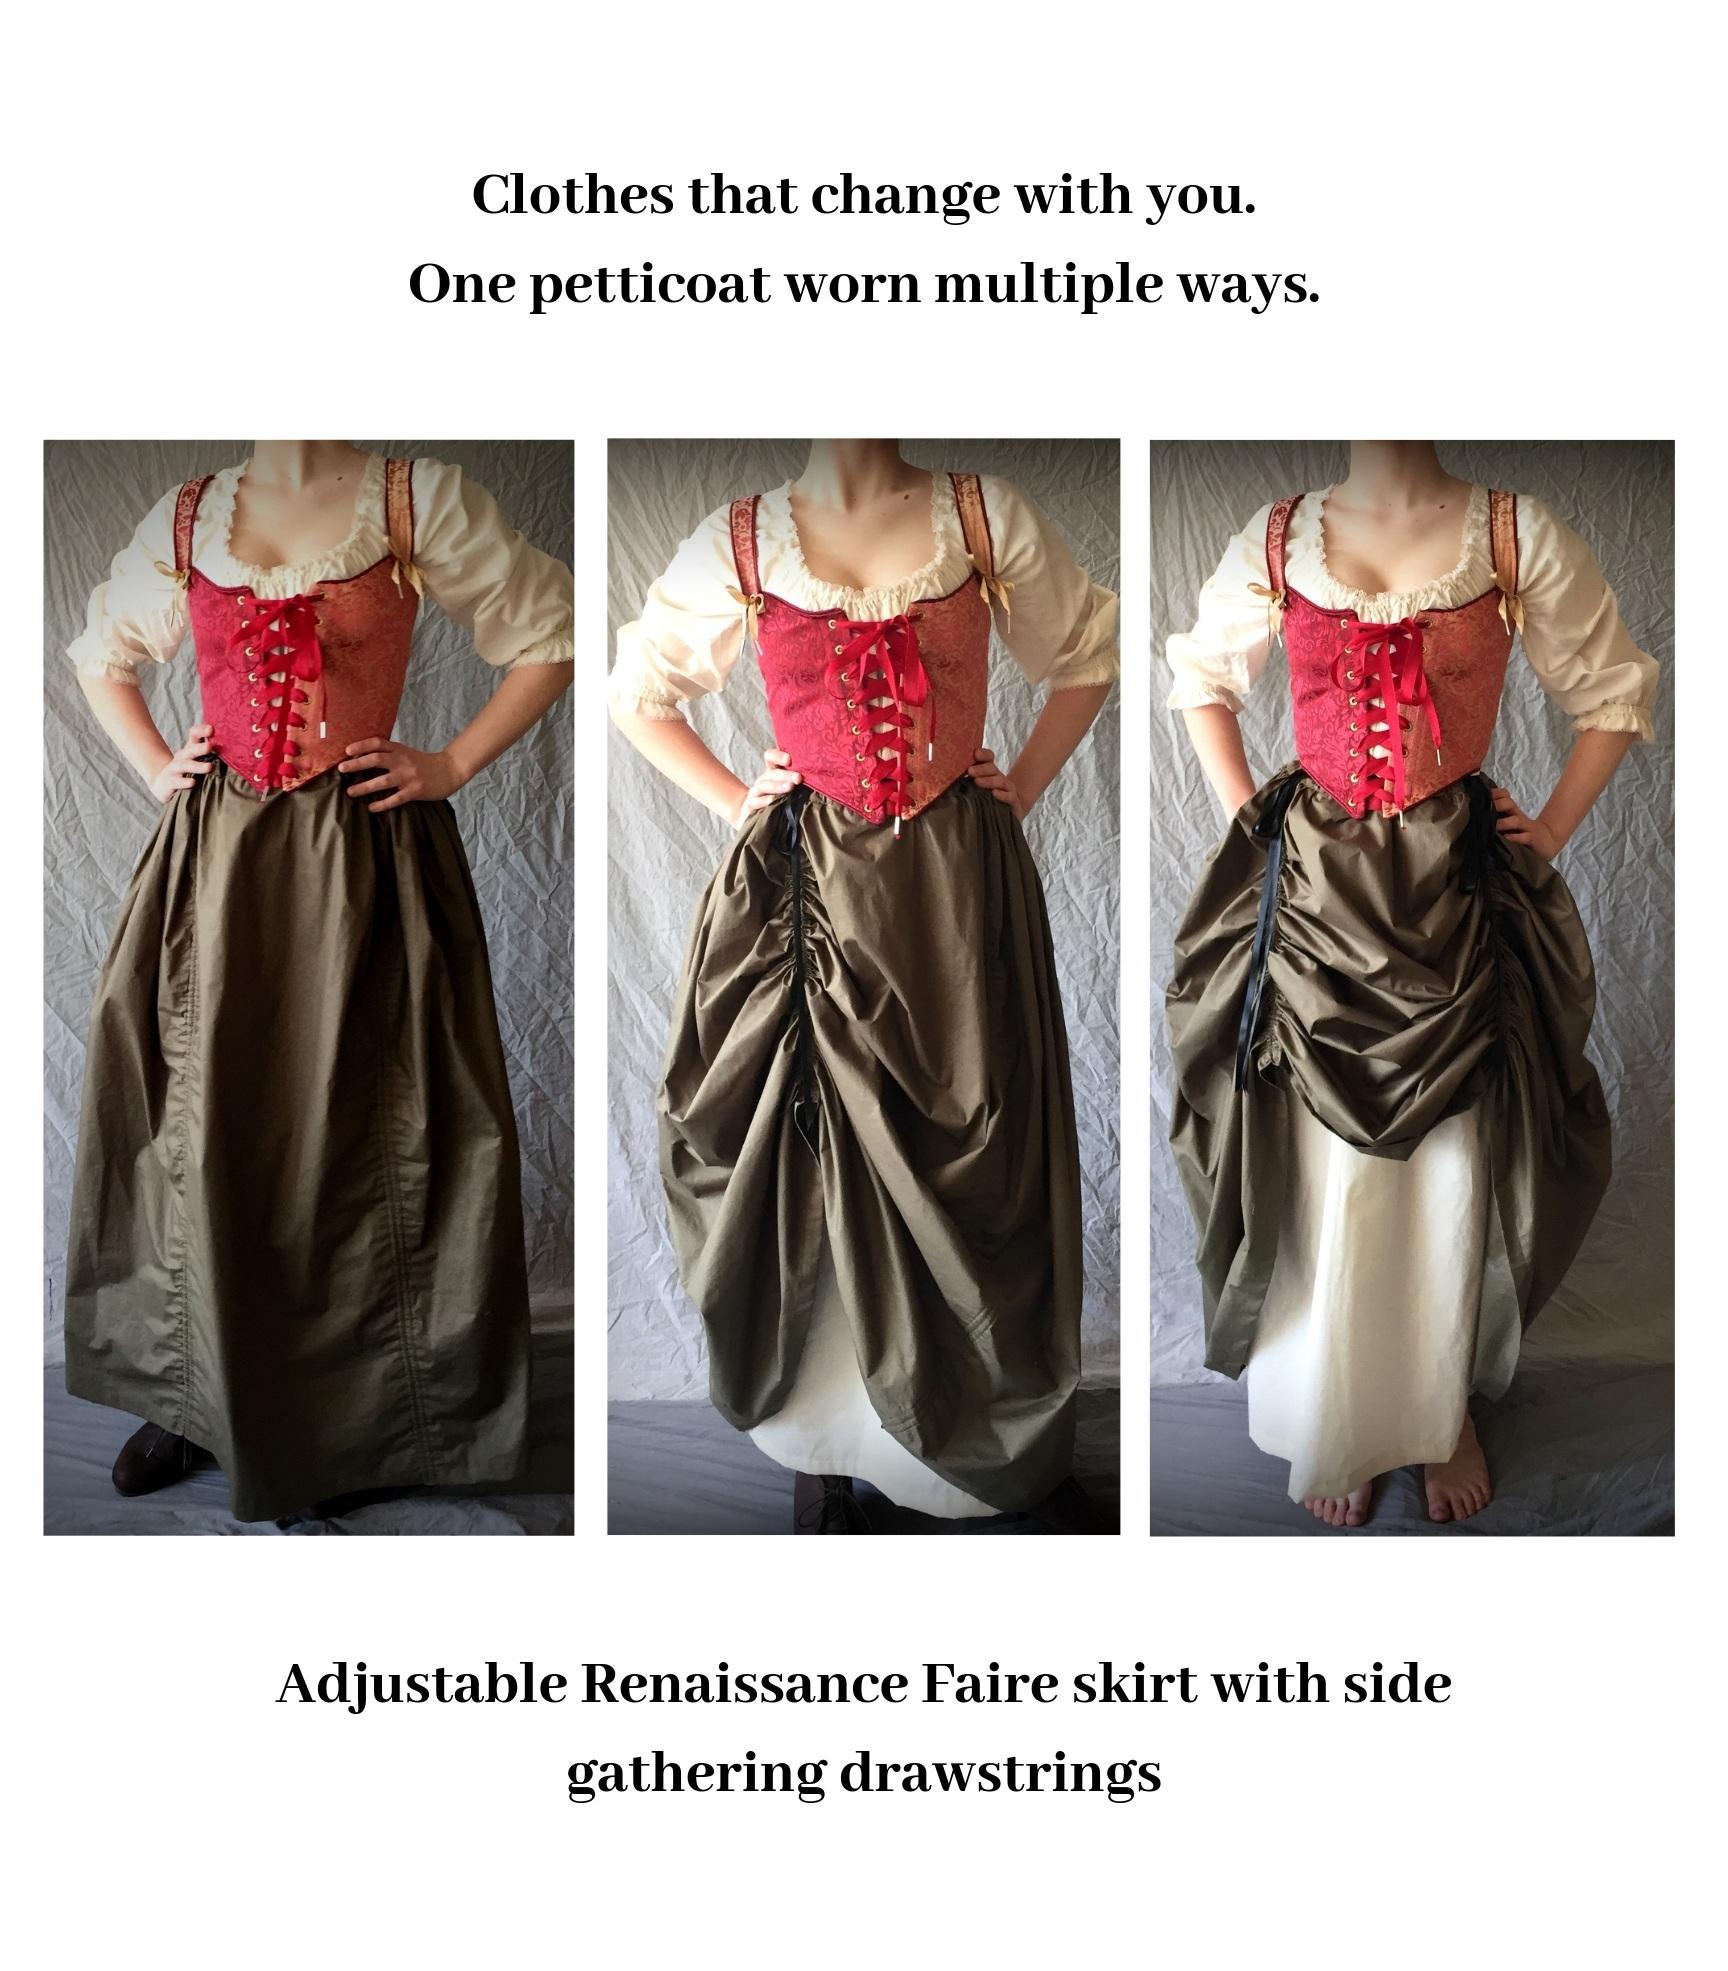 One+petticoat+worn+3+ways.jpg